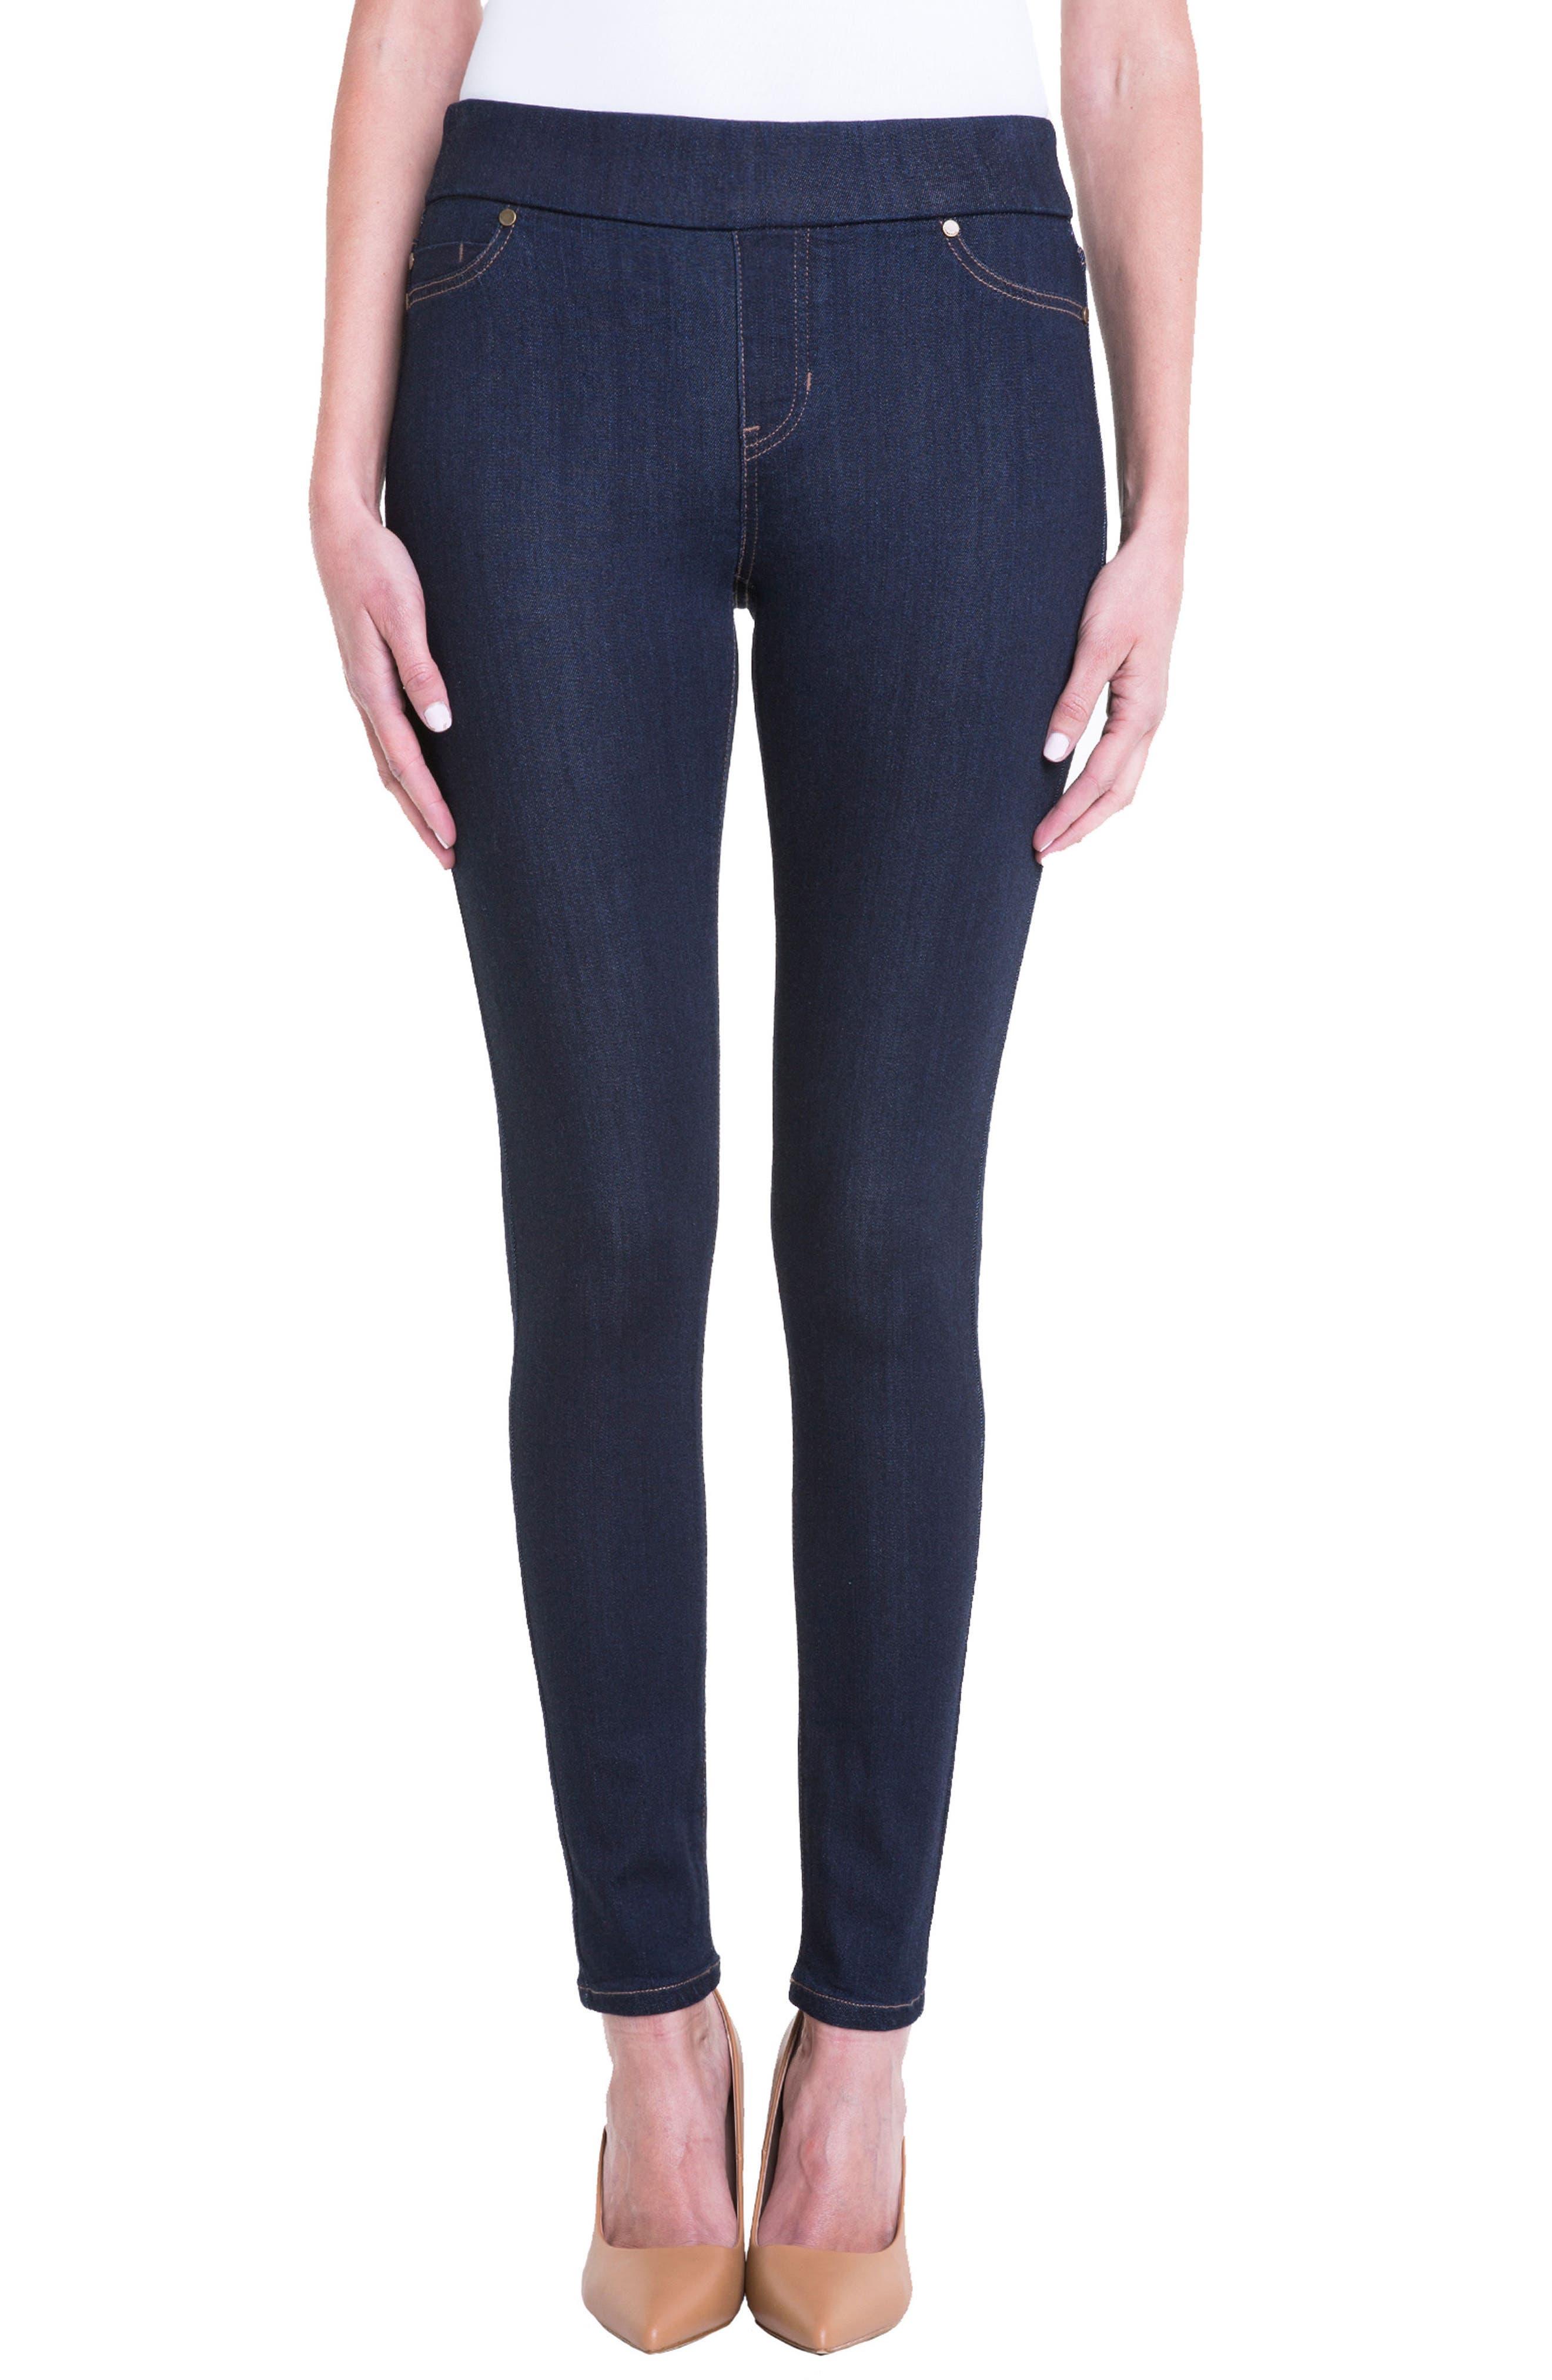 Petite Liverpool Sienna Pull-On Knit Denim Leggings, Blue